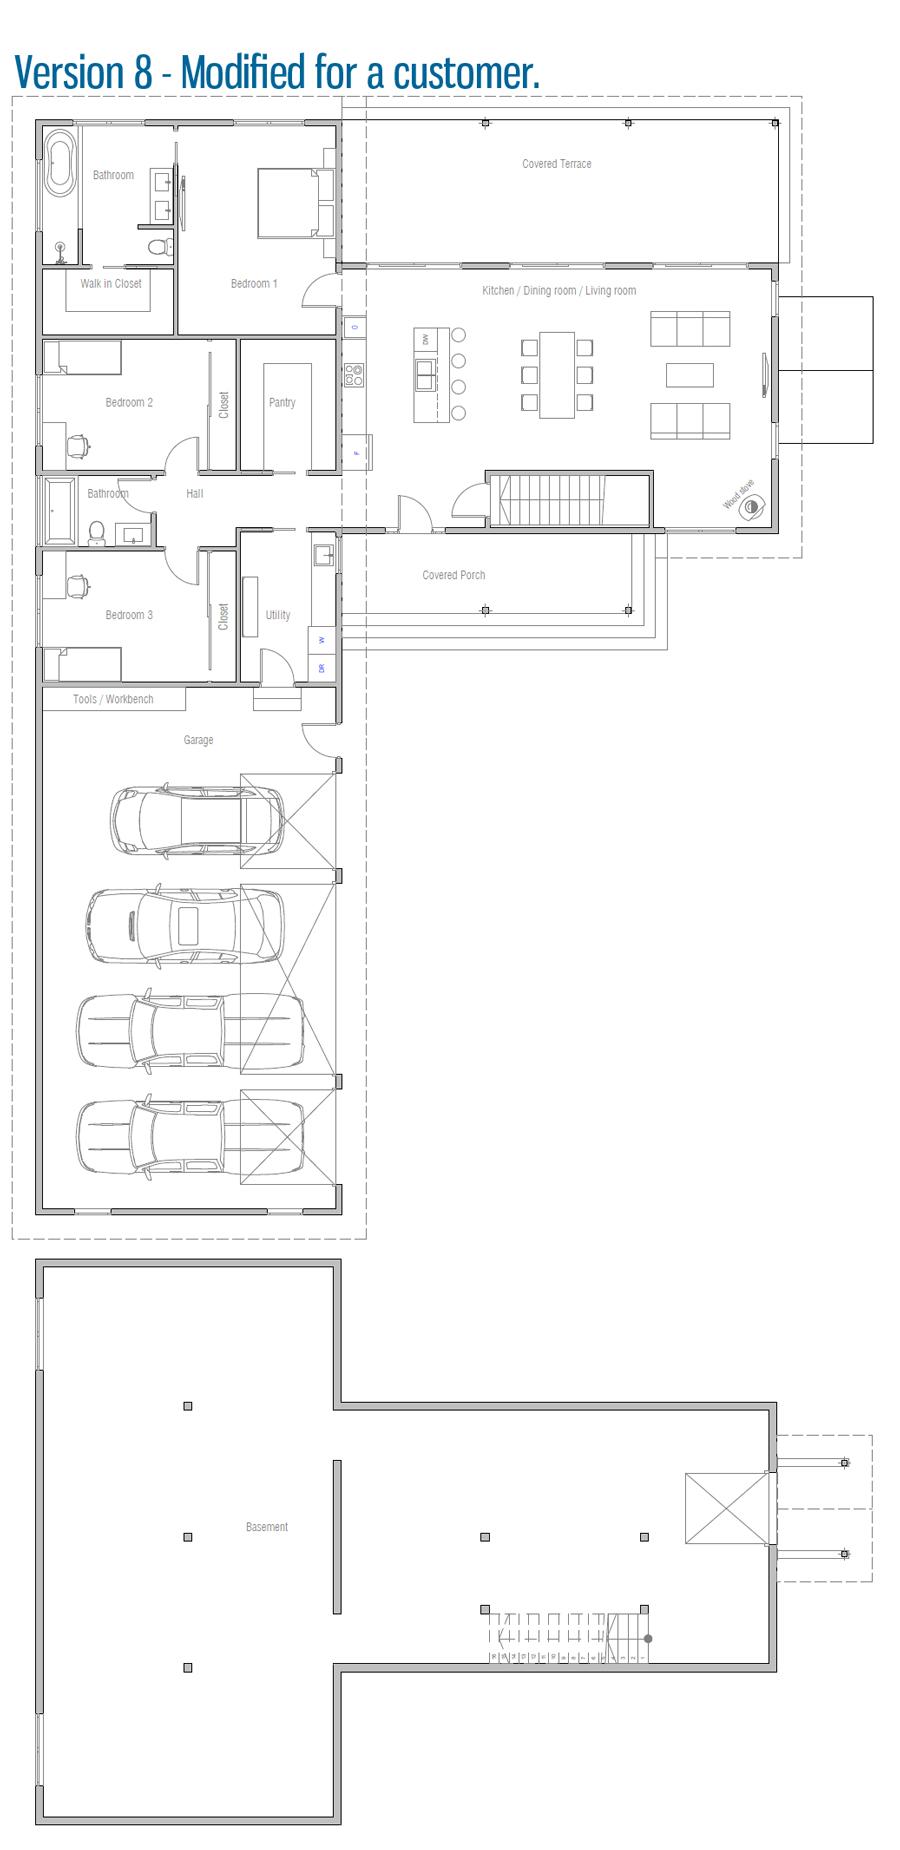 affordable-homes_53_HOUSE_PLAN_CH564_V8.jpg